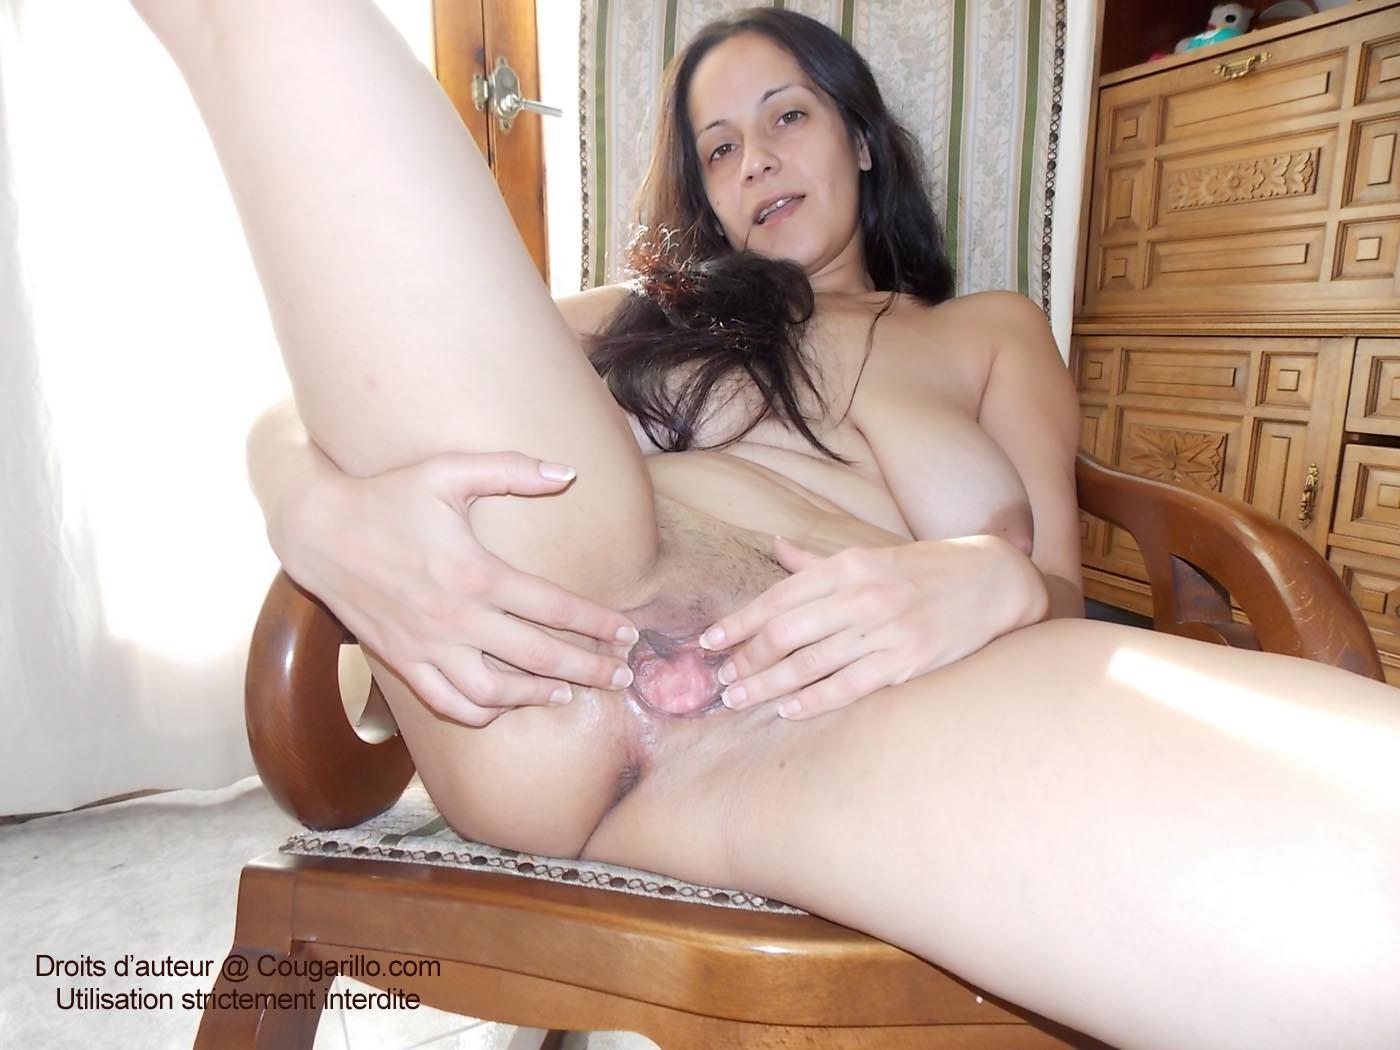 beurette cougar massage sexe angers